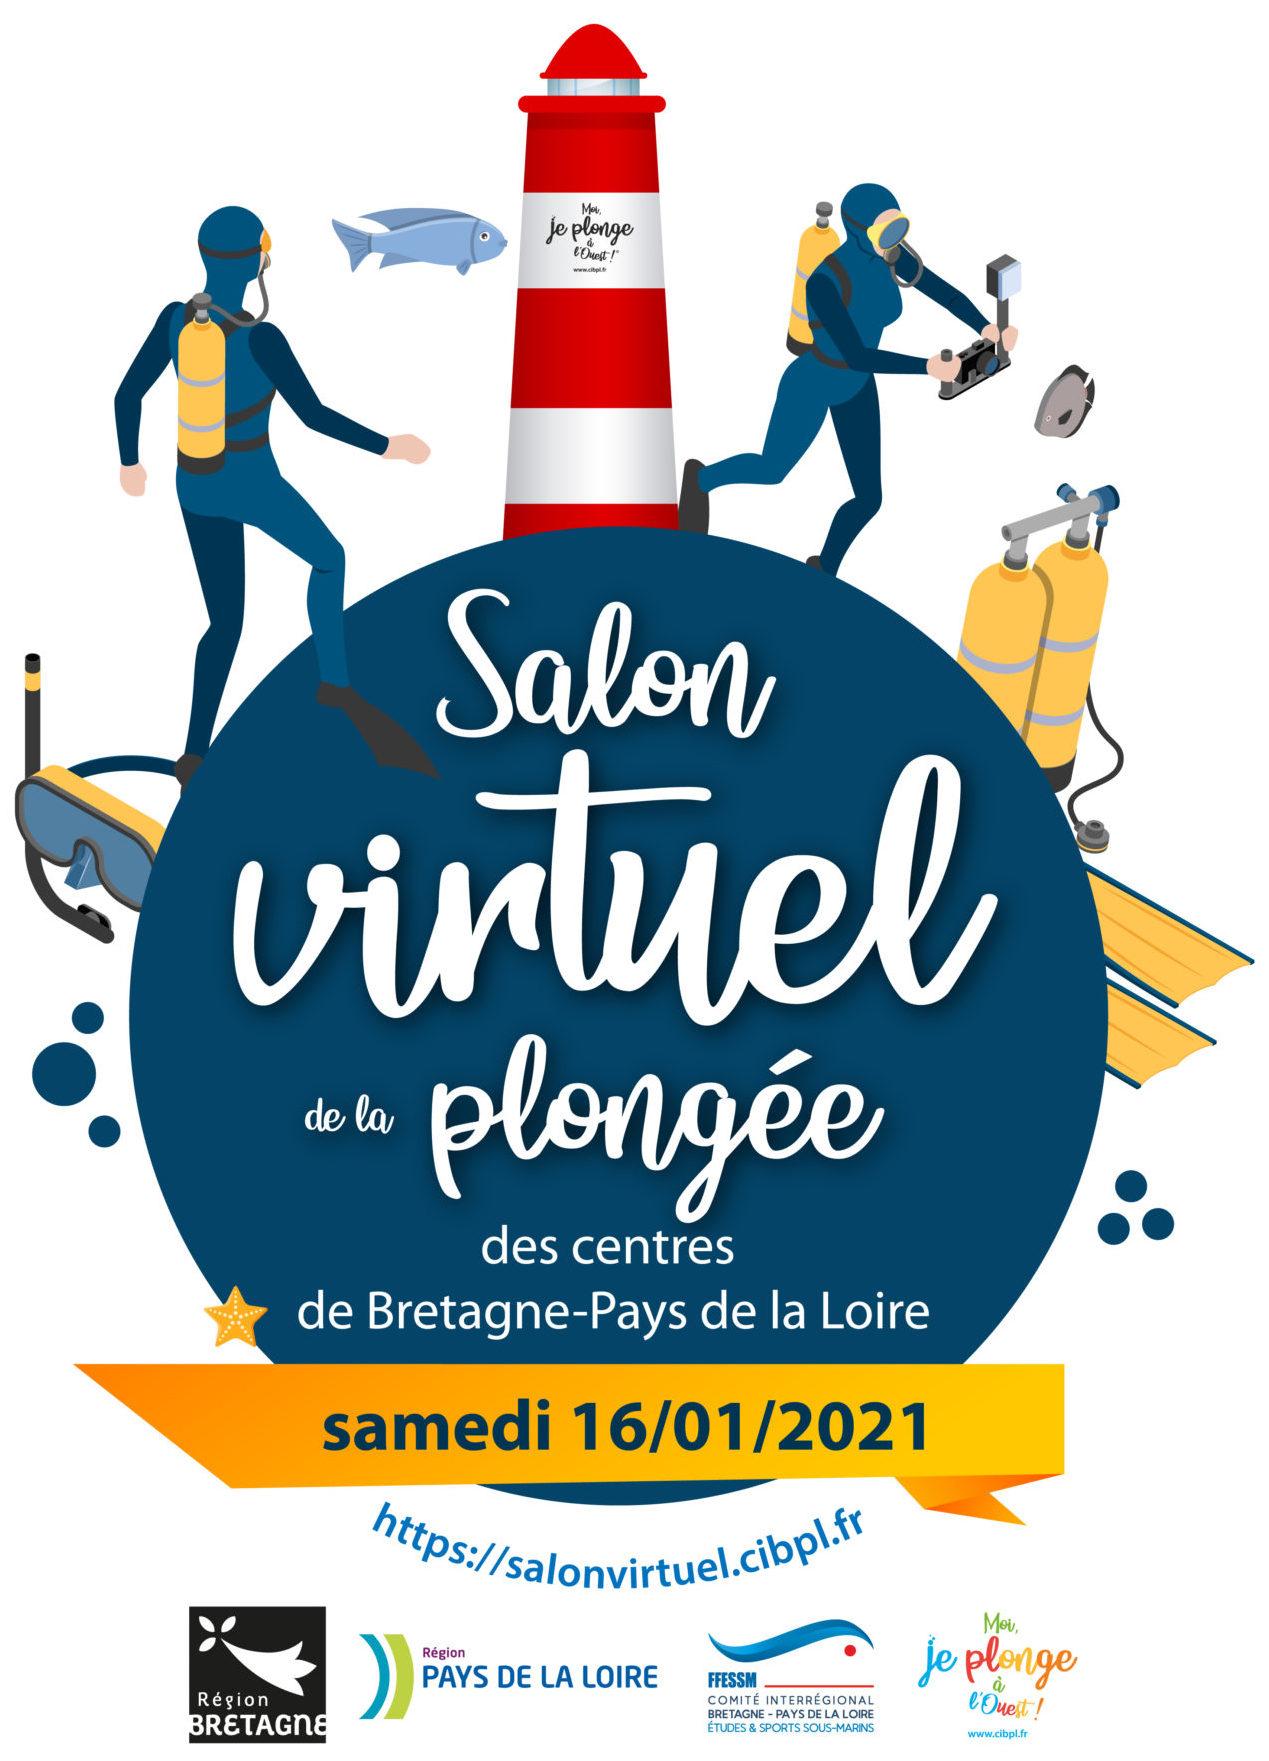 Salon virtuel de la plongée de Bretagne-Pays de la Loire